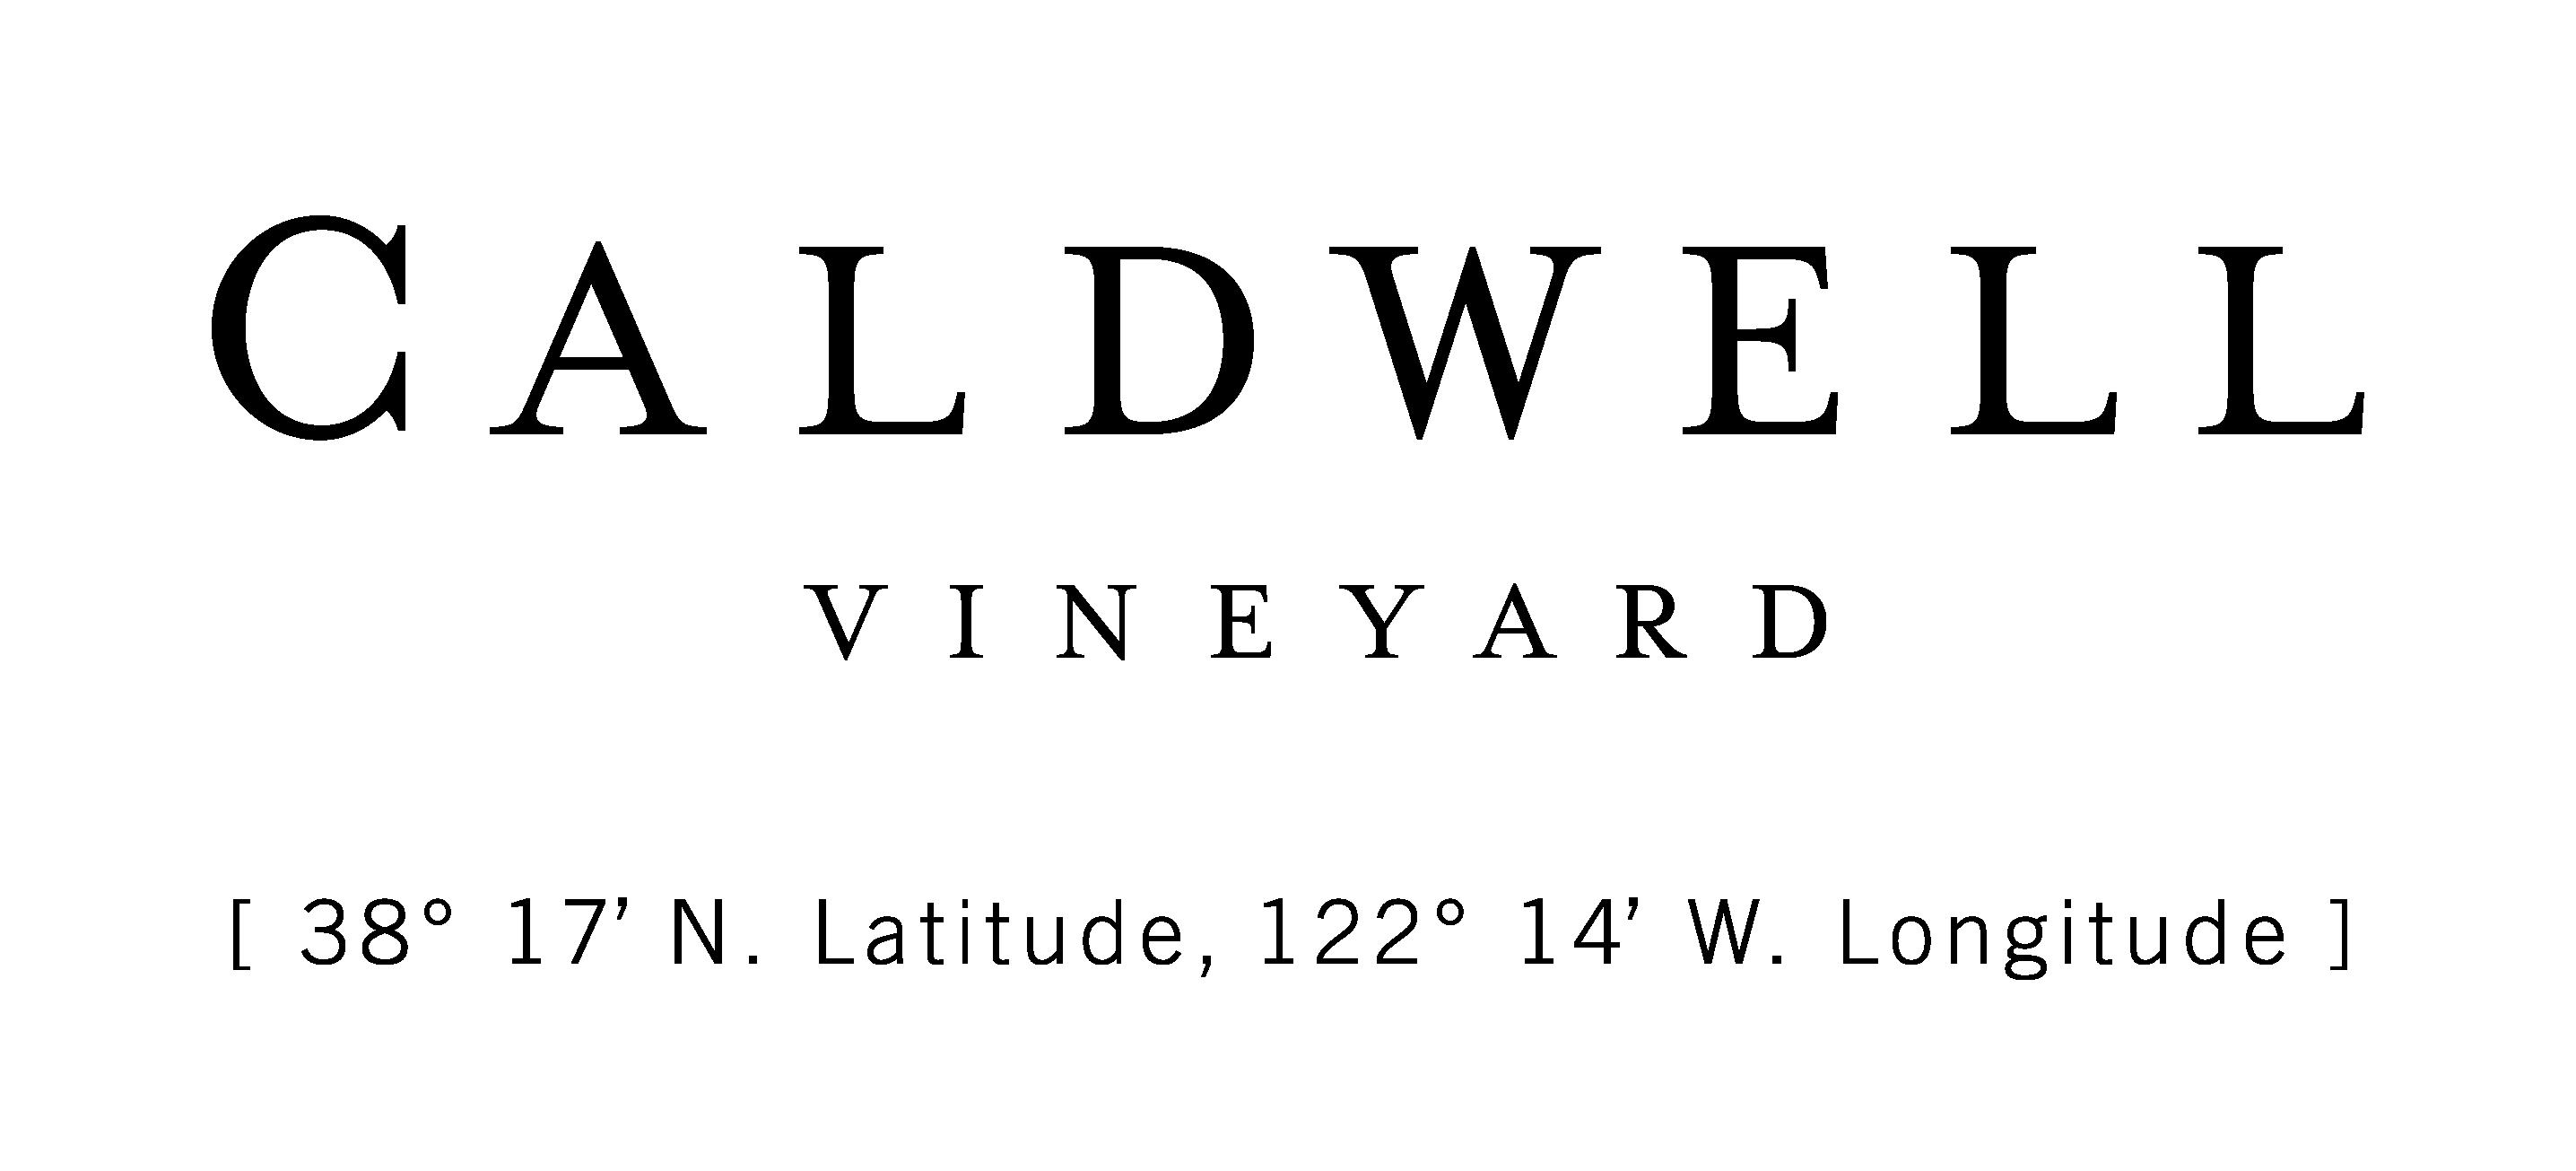 Caldwell Vineyard logo with coordiates_black